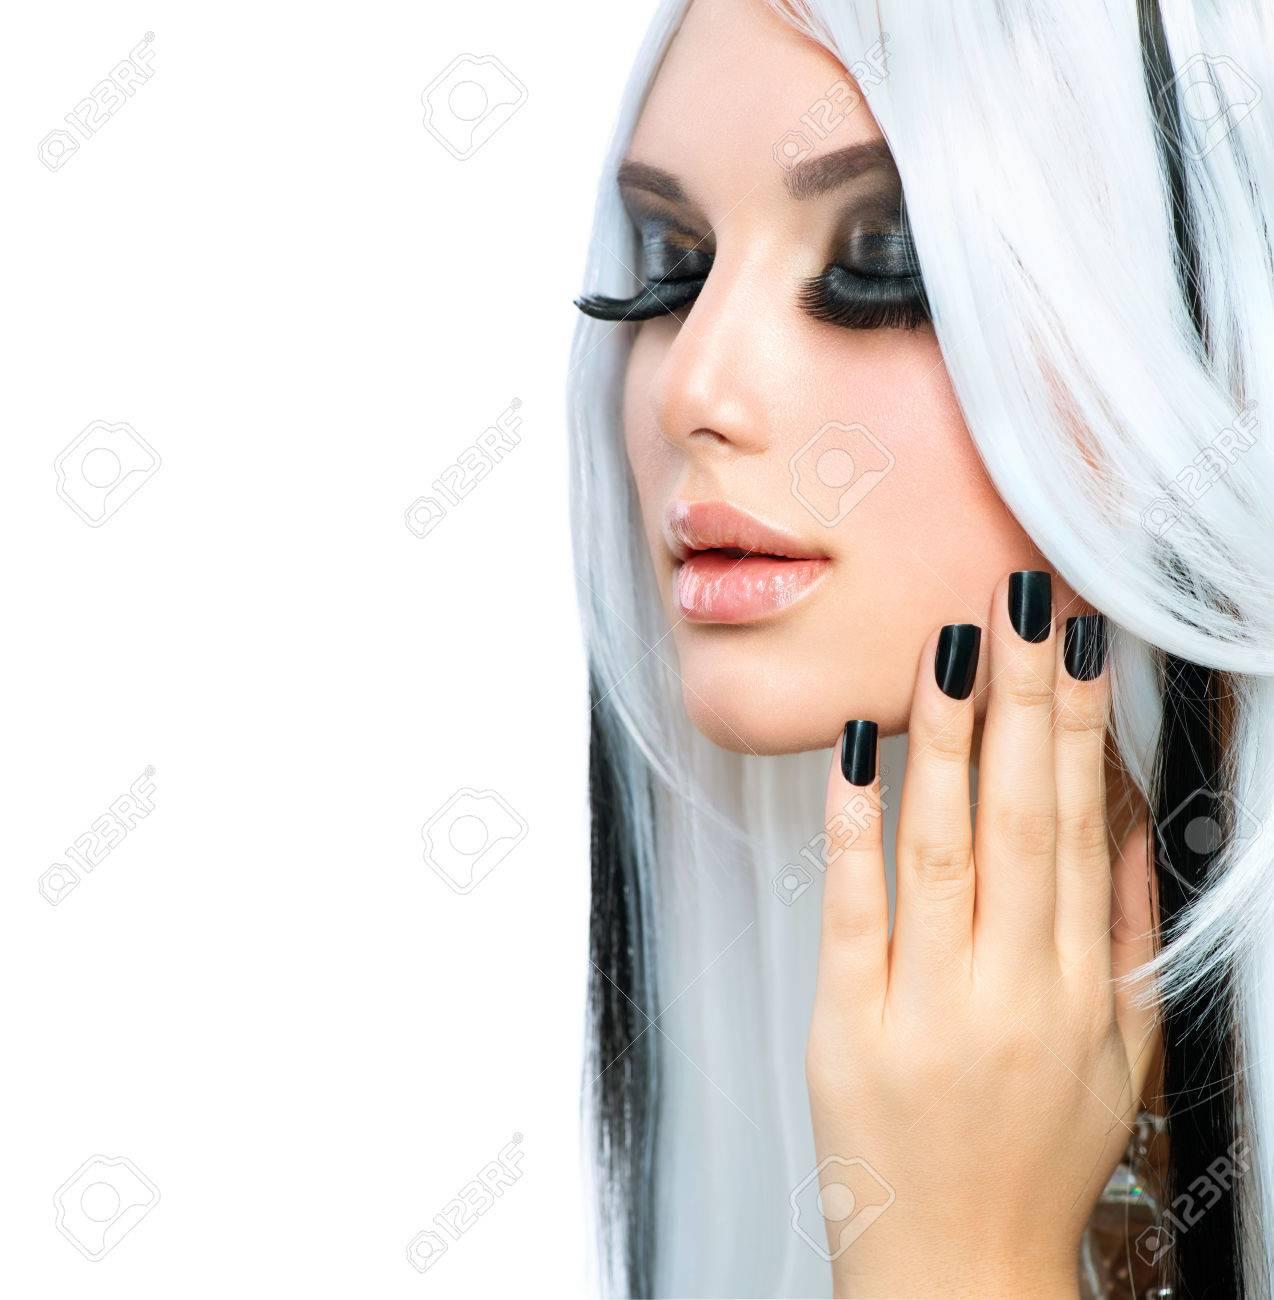 Beauty Fashion Girl black and white style  Long White Hair Stock Photo - 24331834